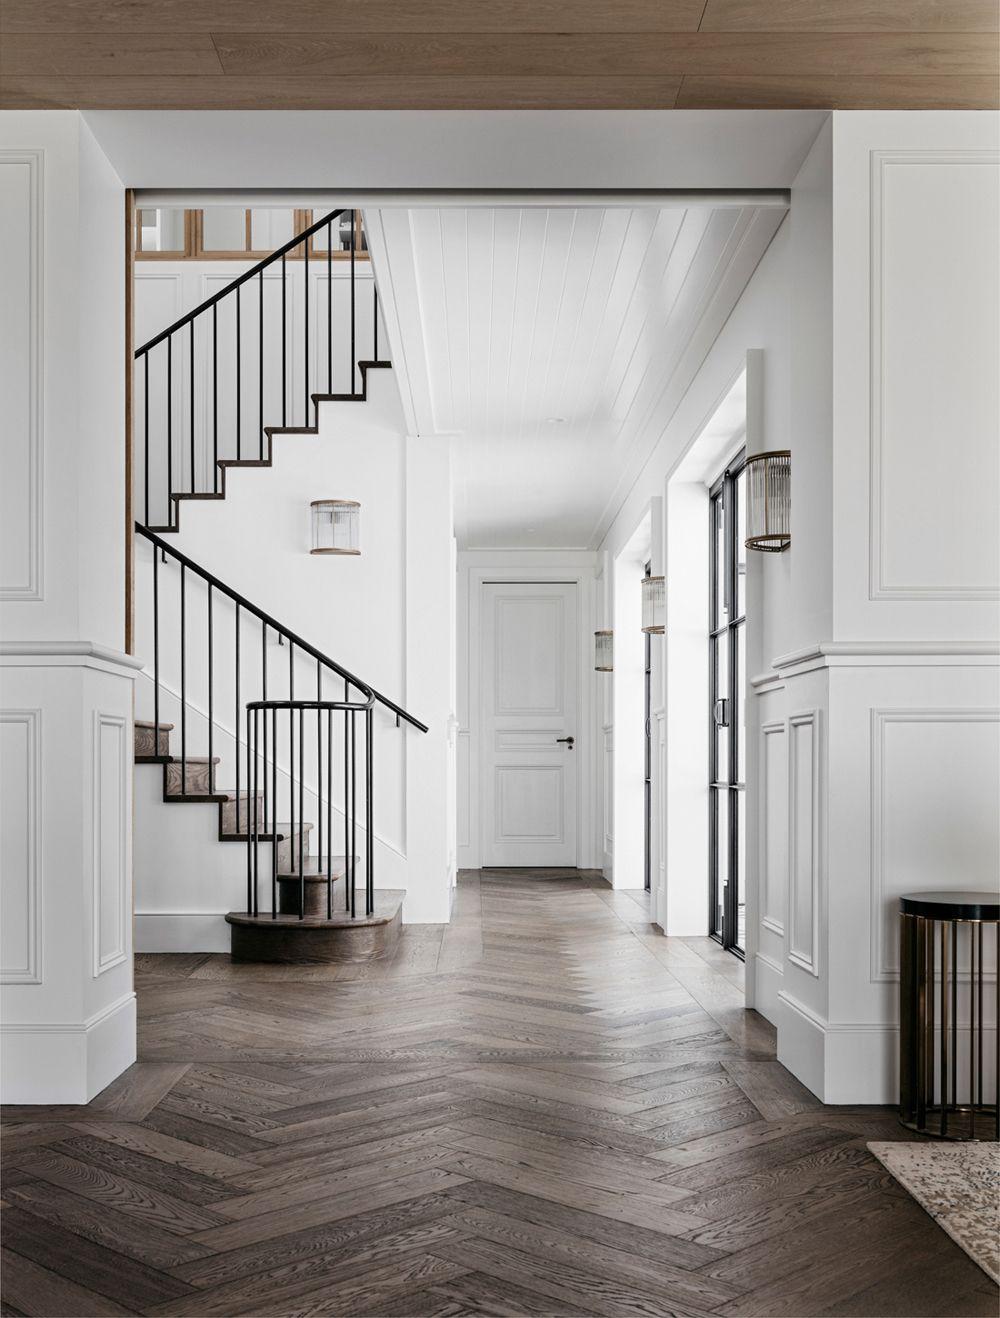 Herringbone floors home architecture design house interior white stone also pin by diane montoya on flooring tiles walls  more in rh pinterest